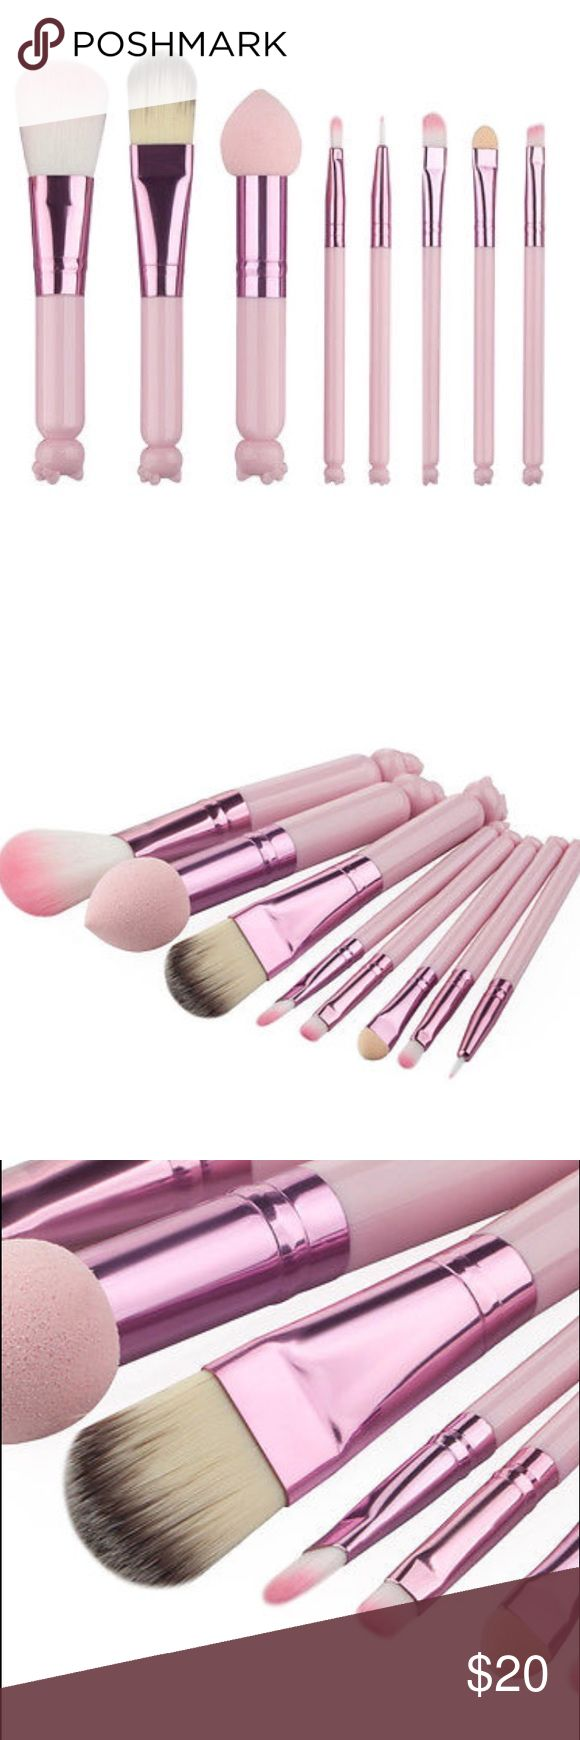 😻NWT Hello kitty 8 pcs makeup brushes set!!! Hot n so cute ! Low stock !! hello kitty  Makeup Brushes & Tools